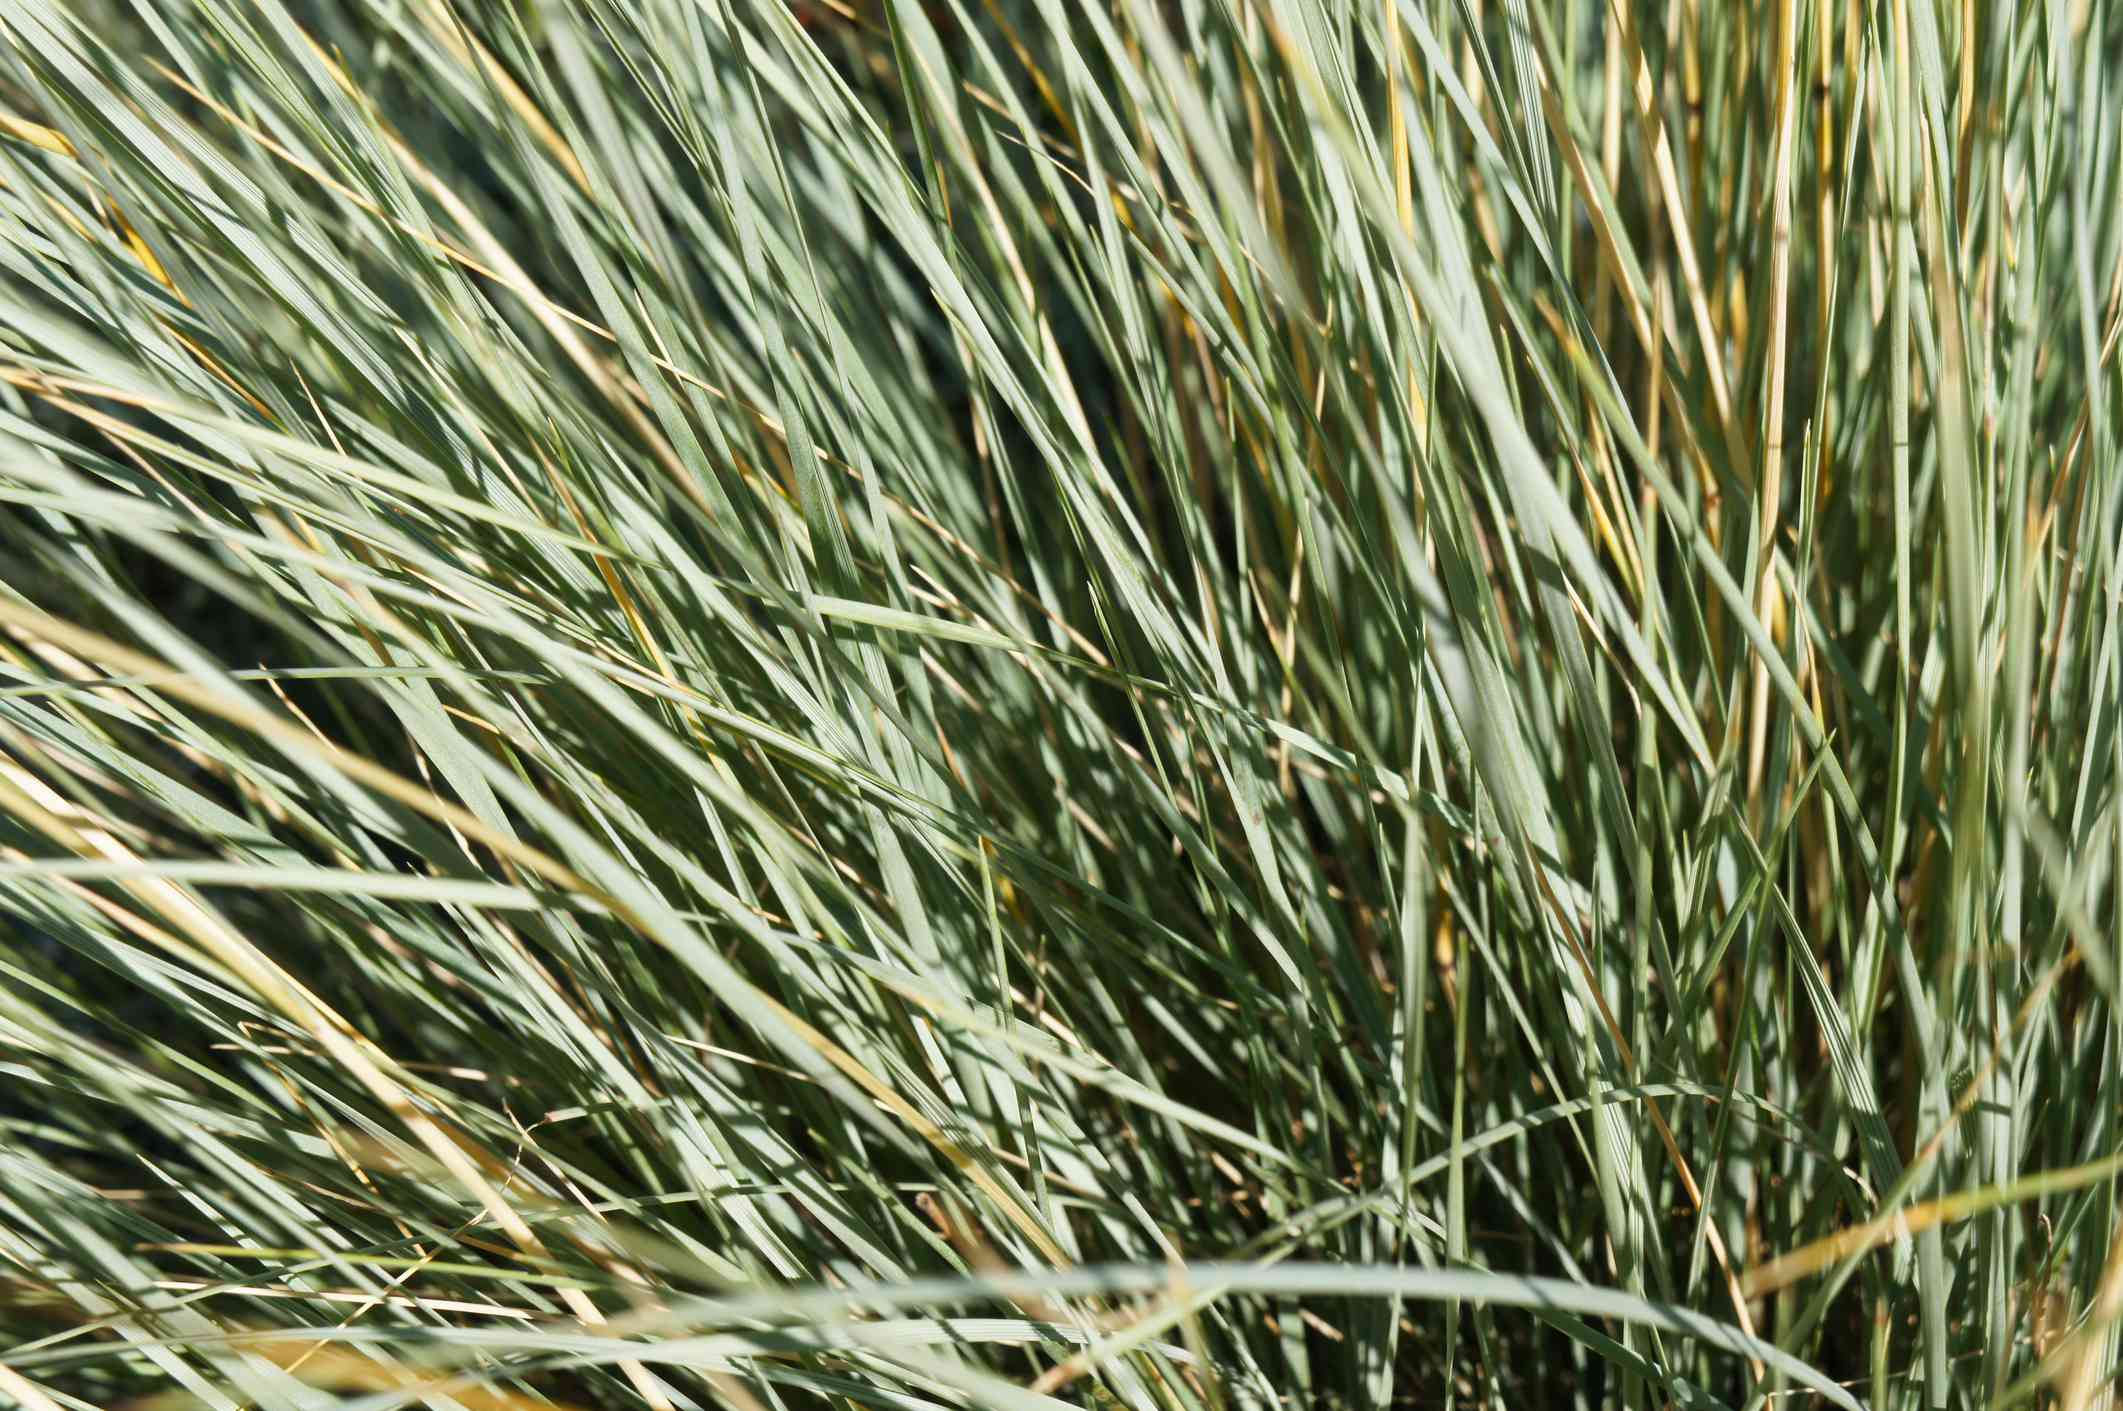 Helictotrichon sempervirens sapphire blue oat grass